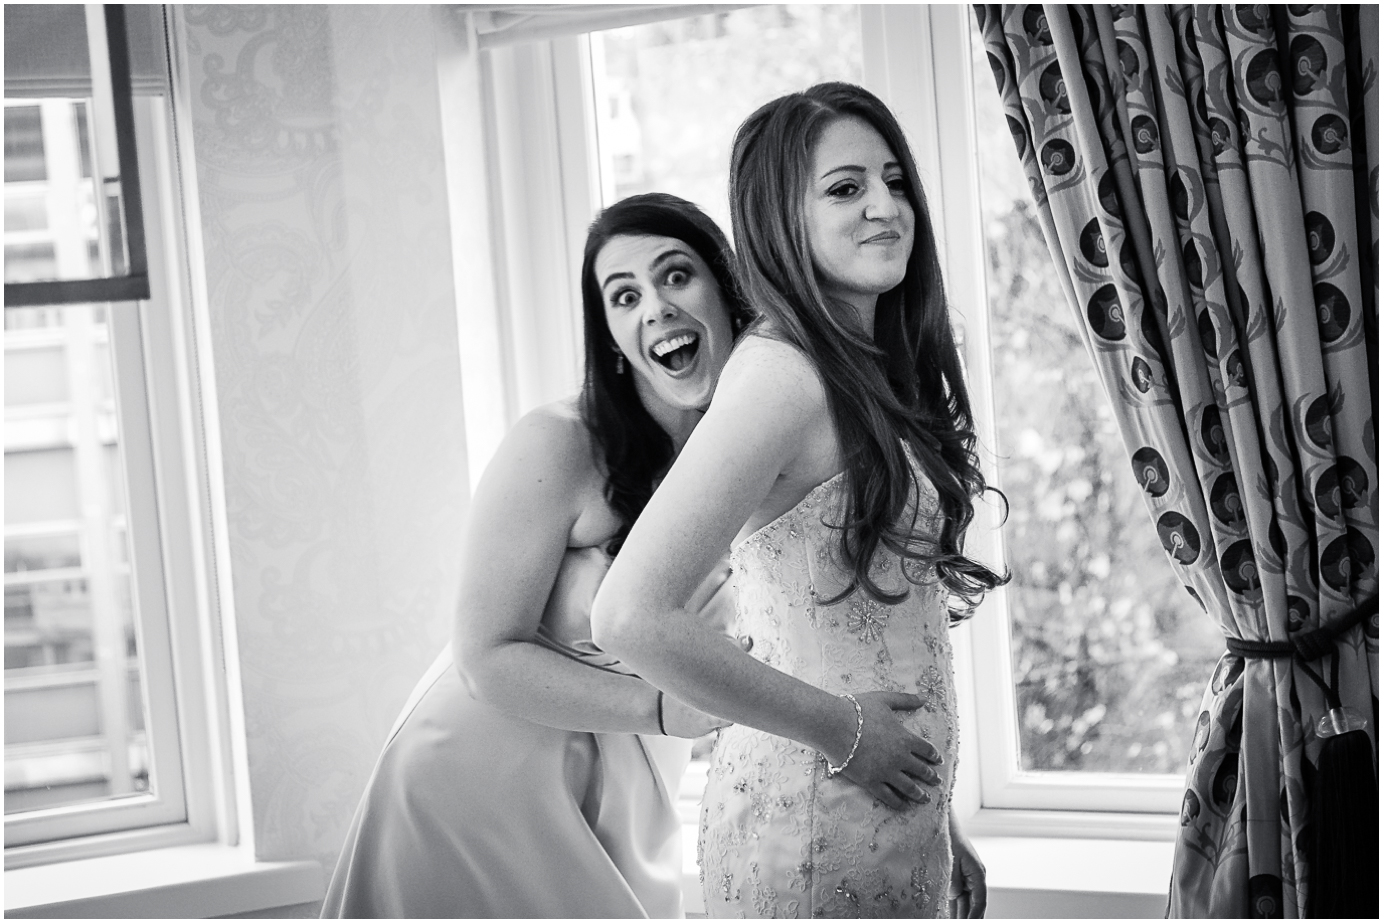 21 - Esmat and Angus - St. Ermin's Hotel London wedding photographer